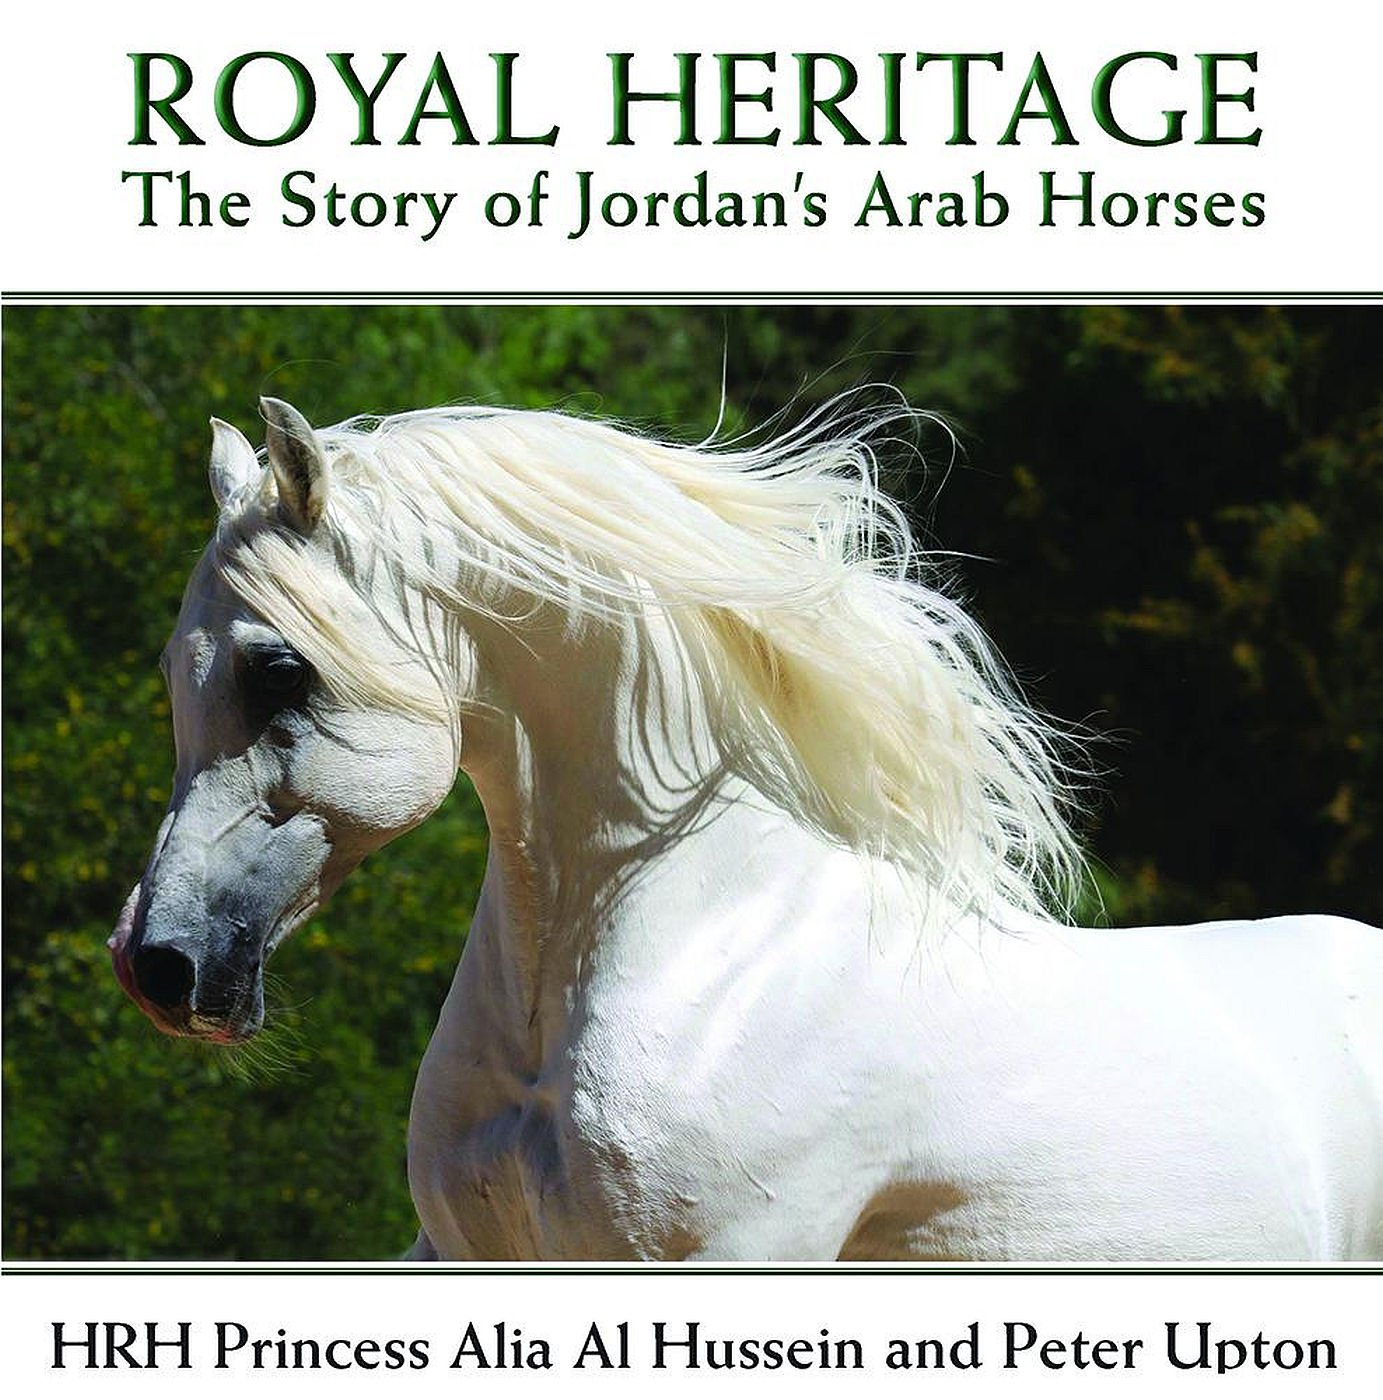 Royal Heritage: The Story of Jordan's Arab Horses